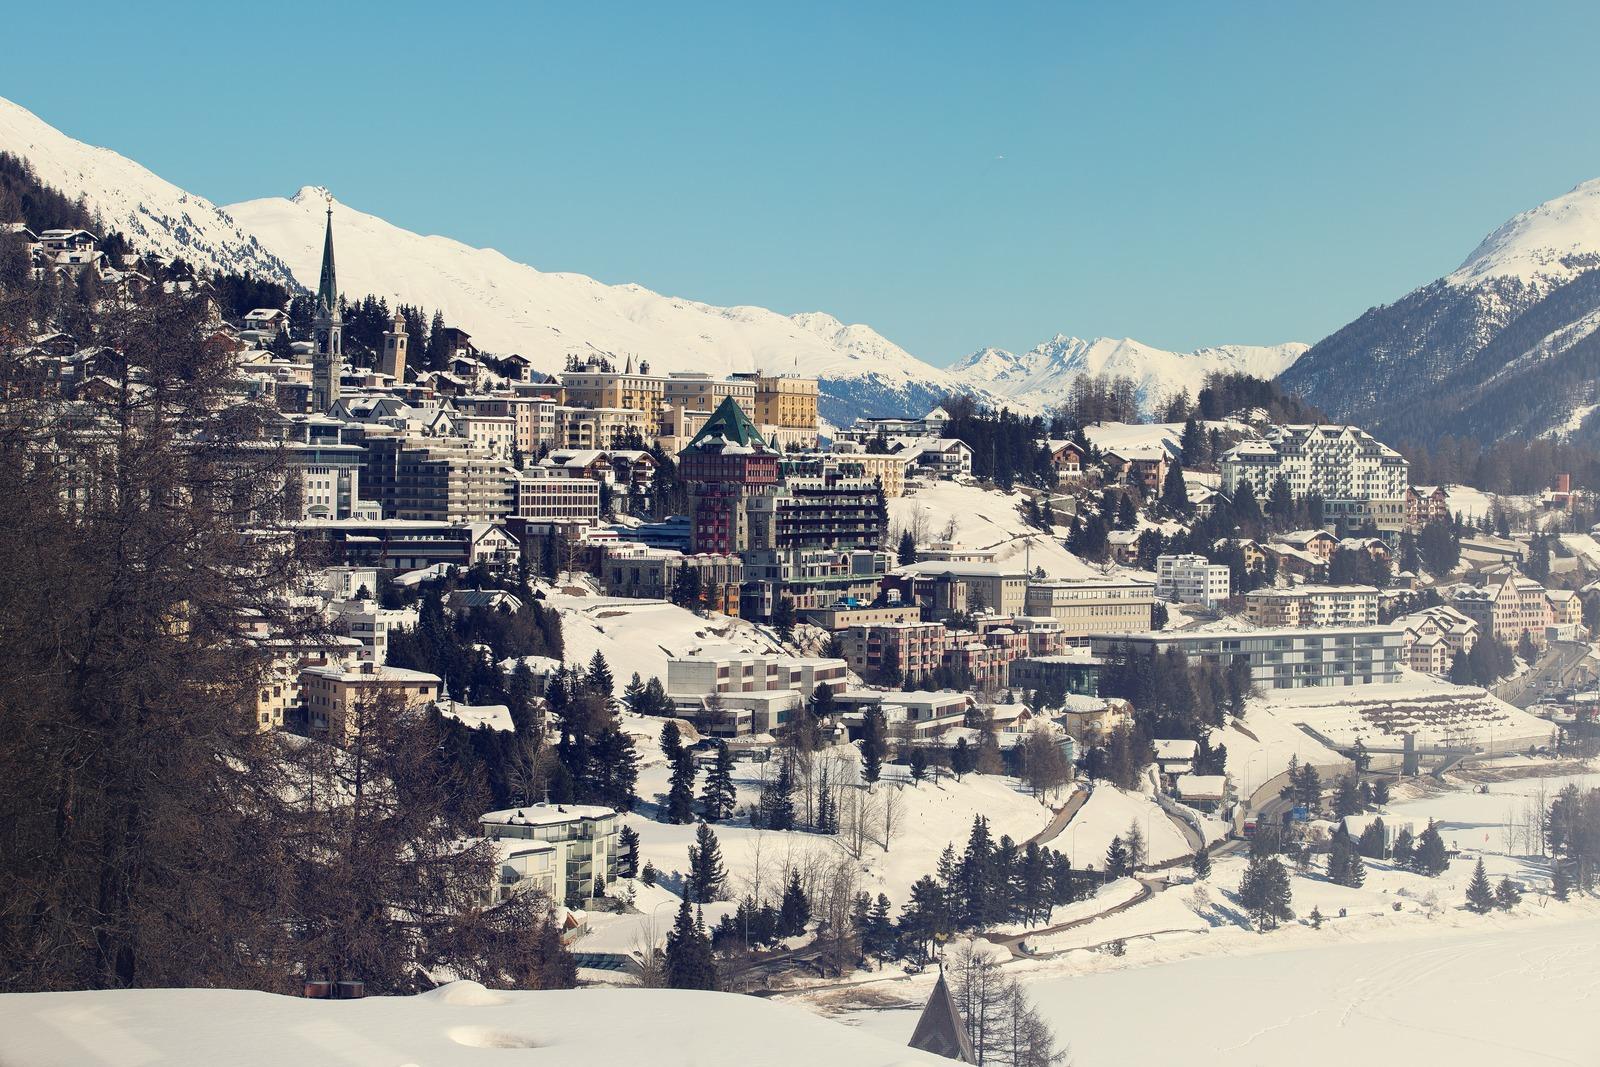 St Moritz - photo by Filip Zuan